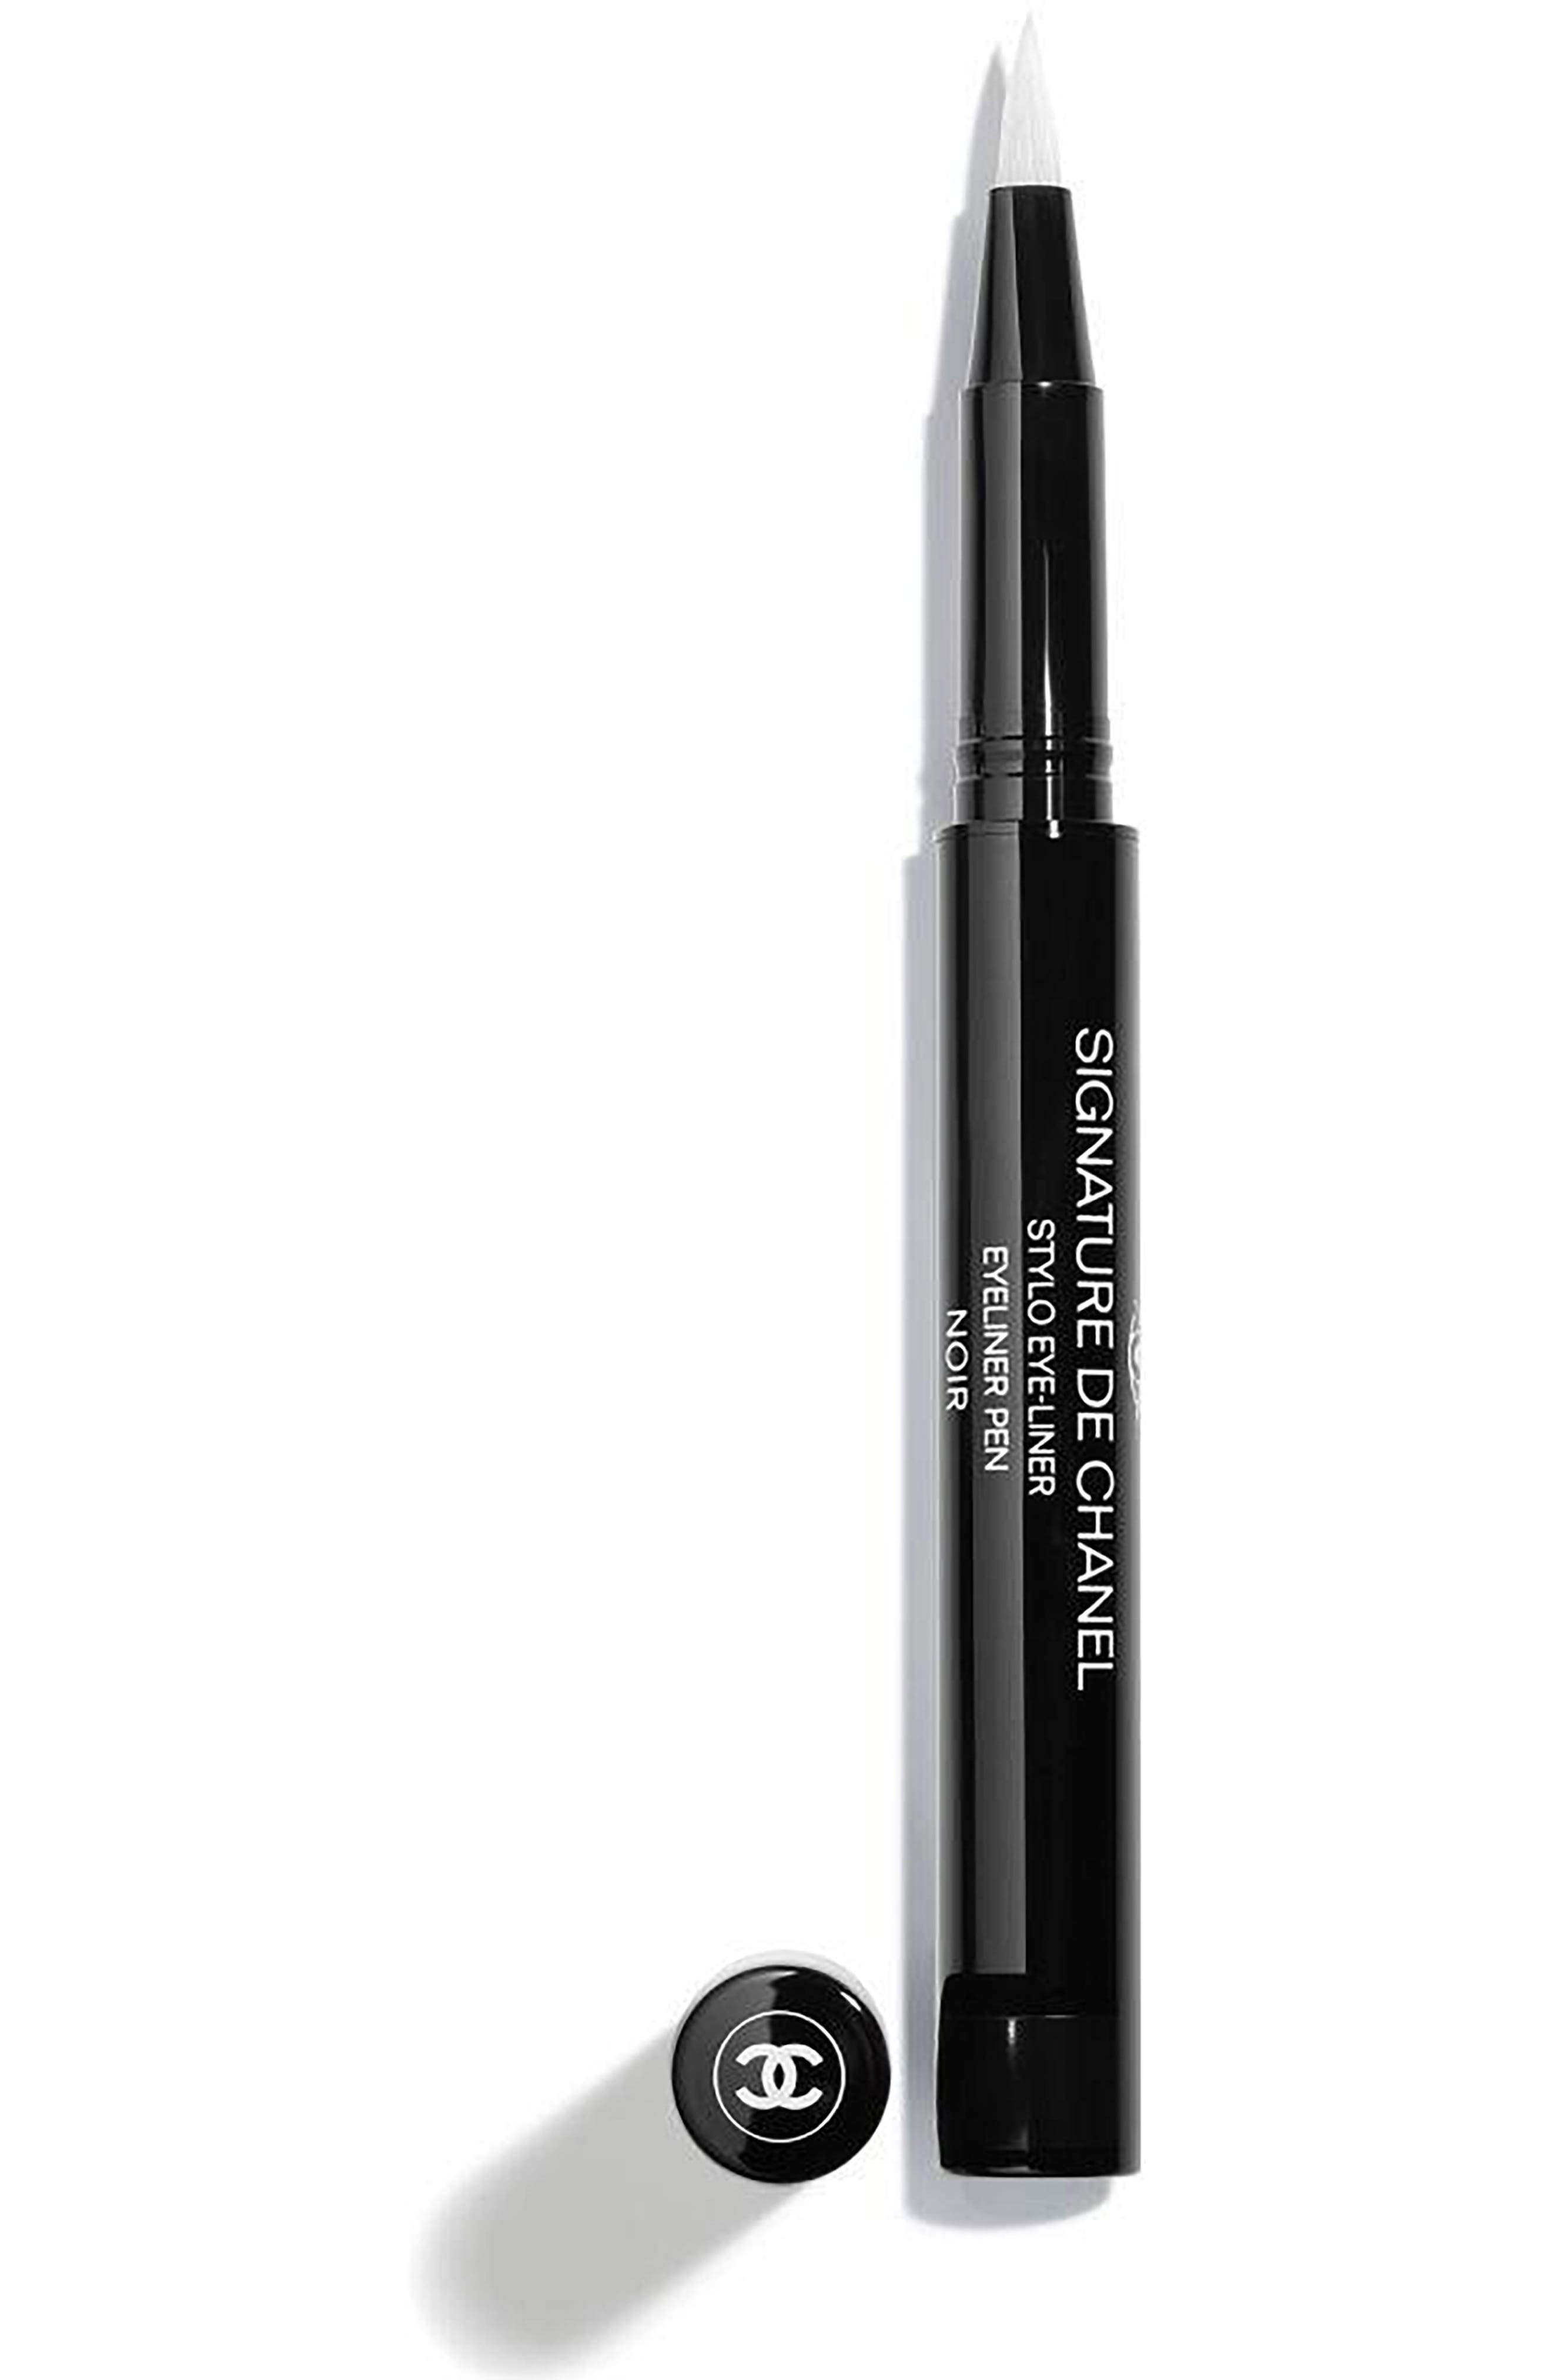 CHANEL, SIGNATURE DE CHANEL Intense Longwear Eyeliner Pen, Main thumbnail 1, color, NO COLOR